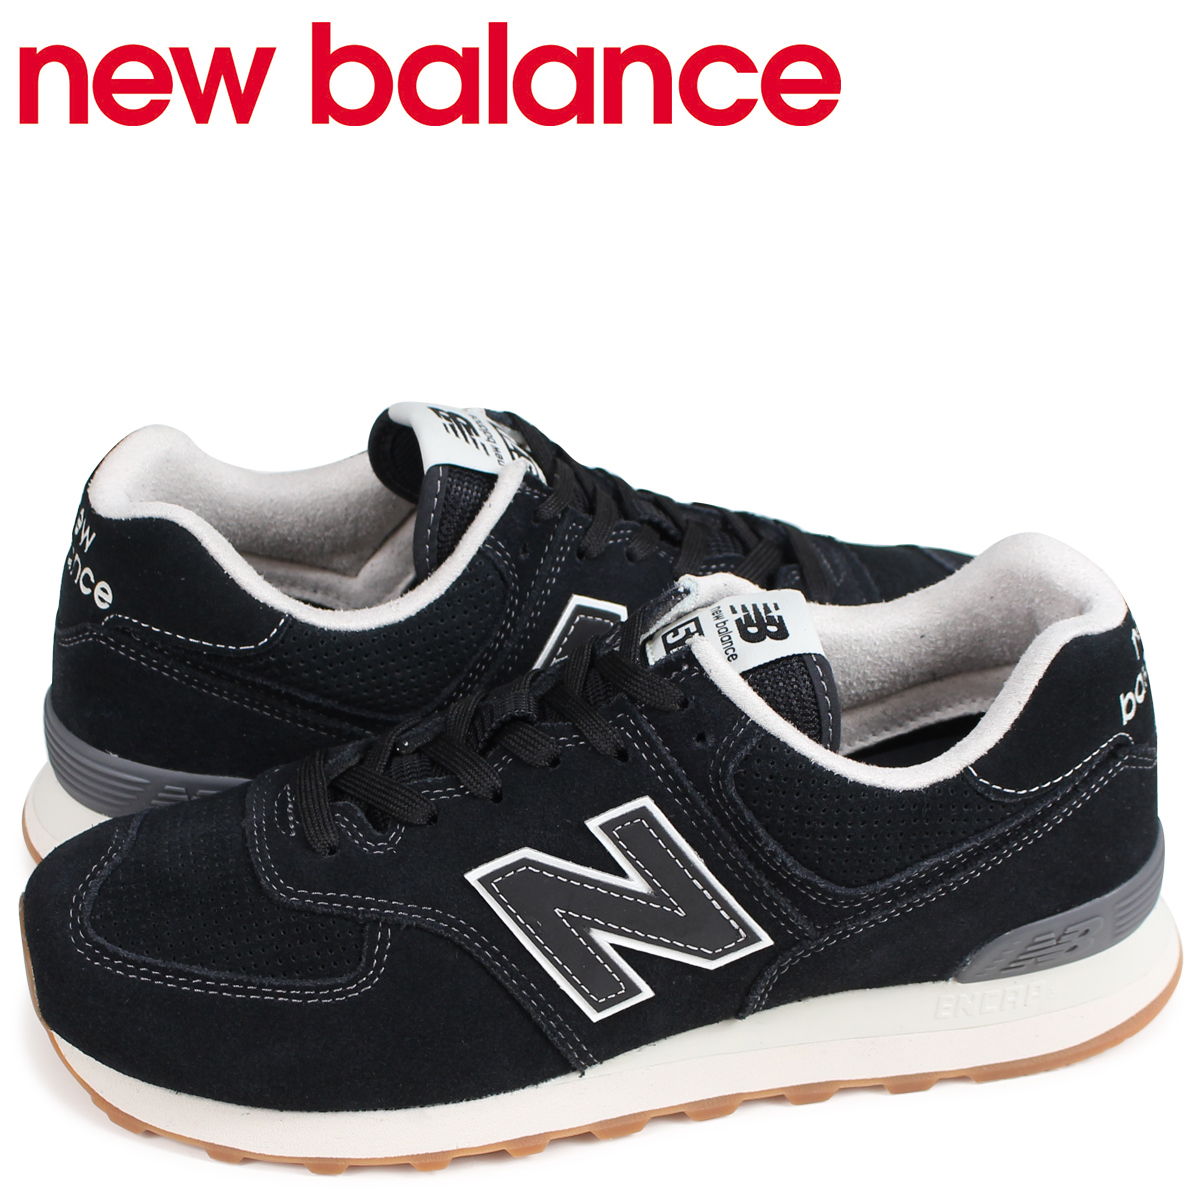 promo code 23049 14de9 New Balance new balance 574 men's sneakers ML574ESE D Wise black